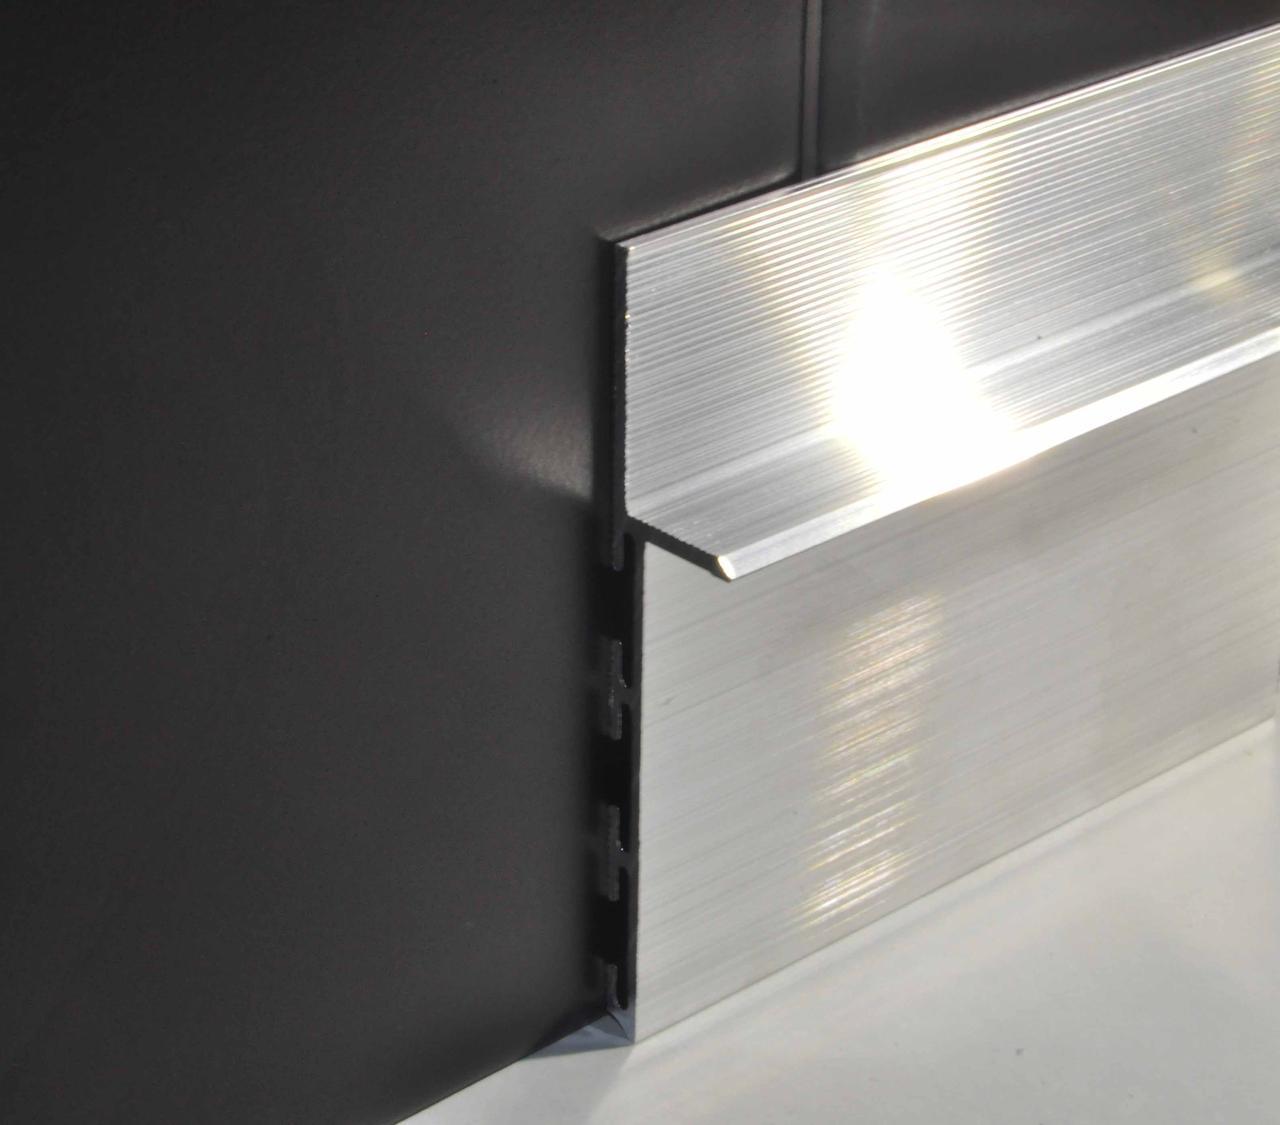 Плинтус алюминиевый скрытого монтажа под гипсокартон Braz Line 80х3000 мм без покрытия BL3104BP